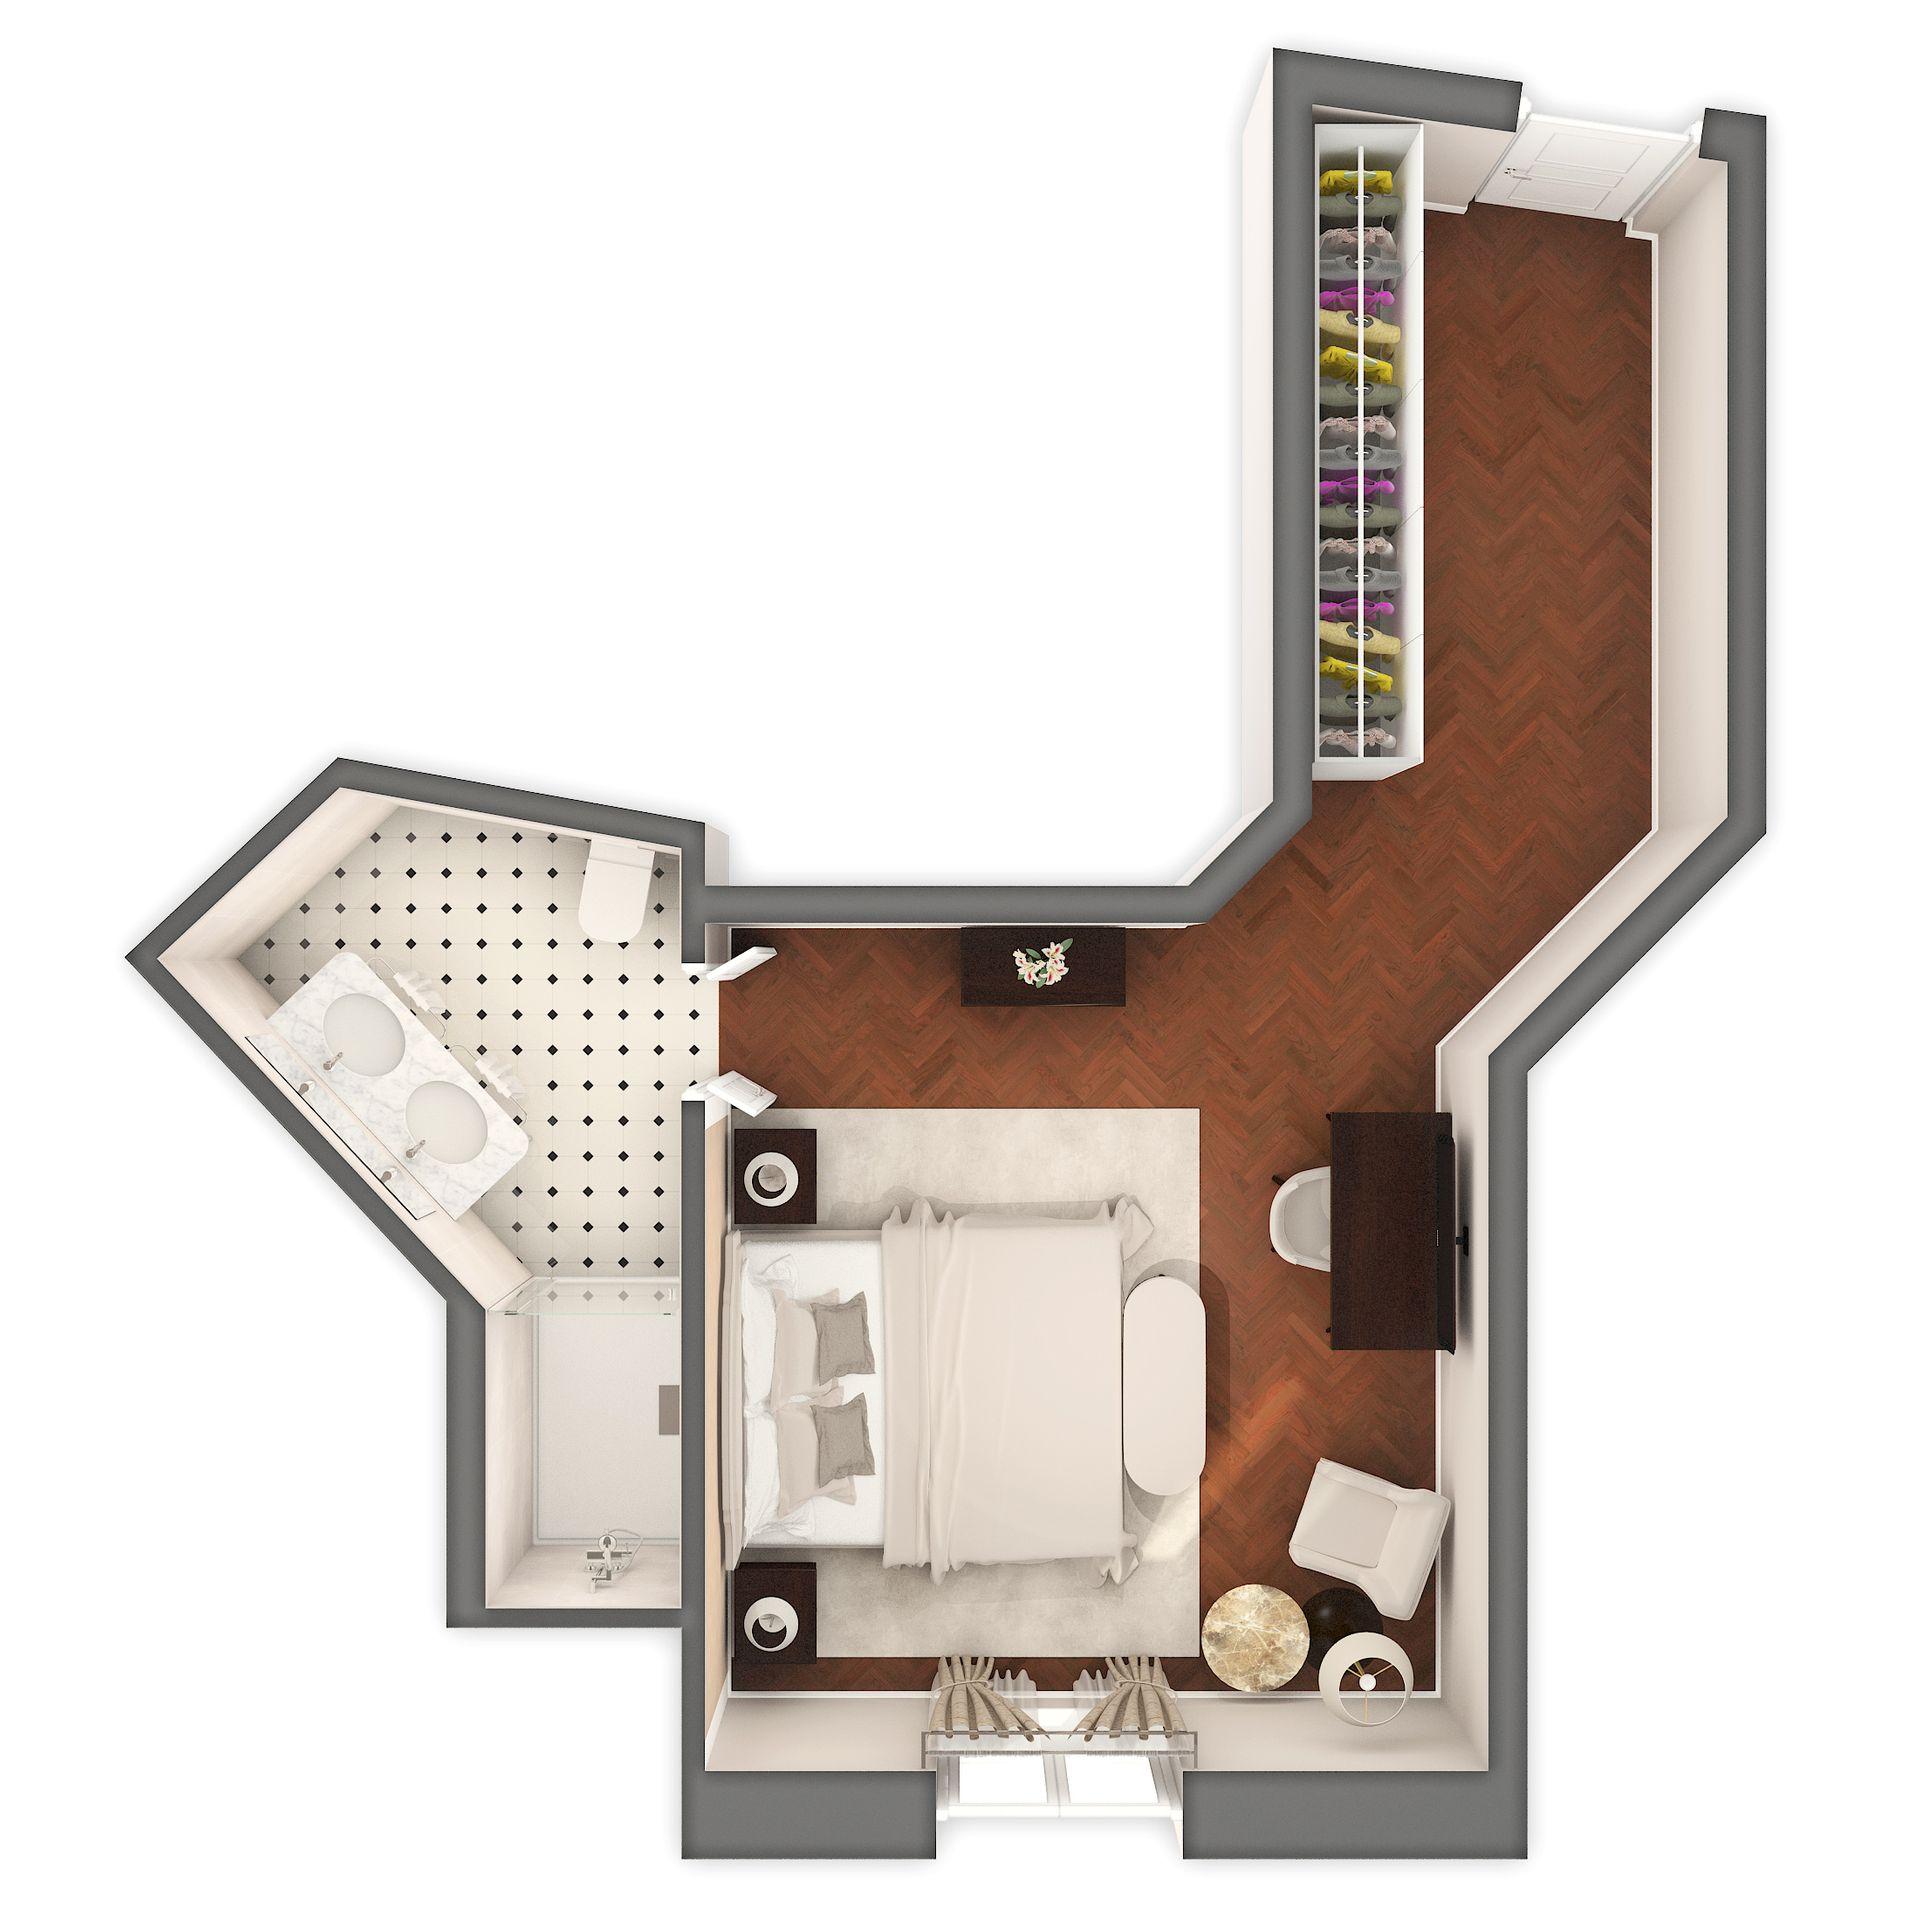 Deluxe Double Room Historical Villa 28 m² Sea View-4